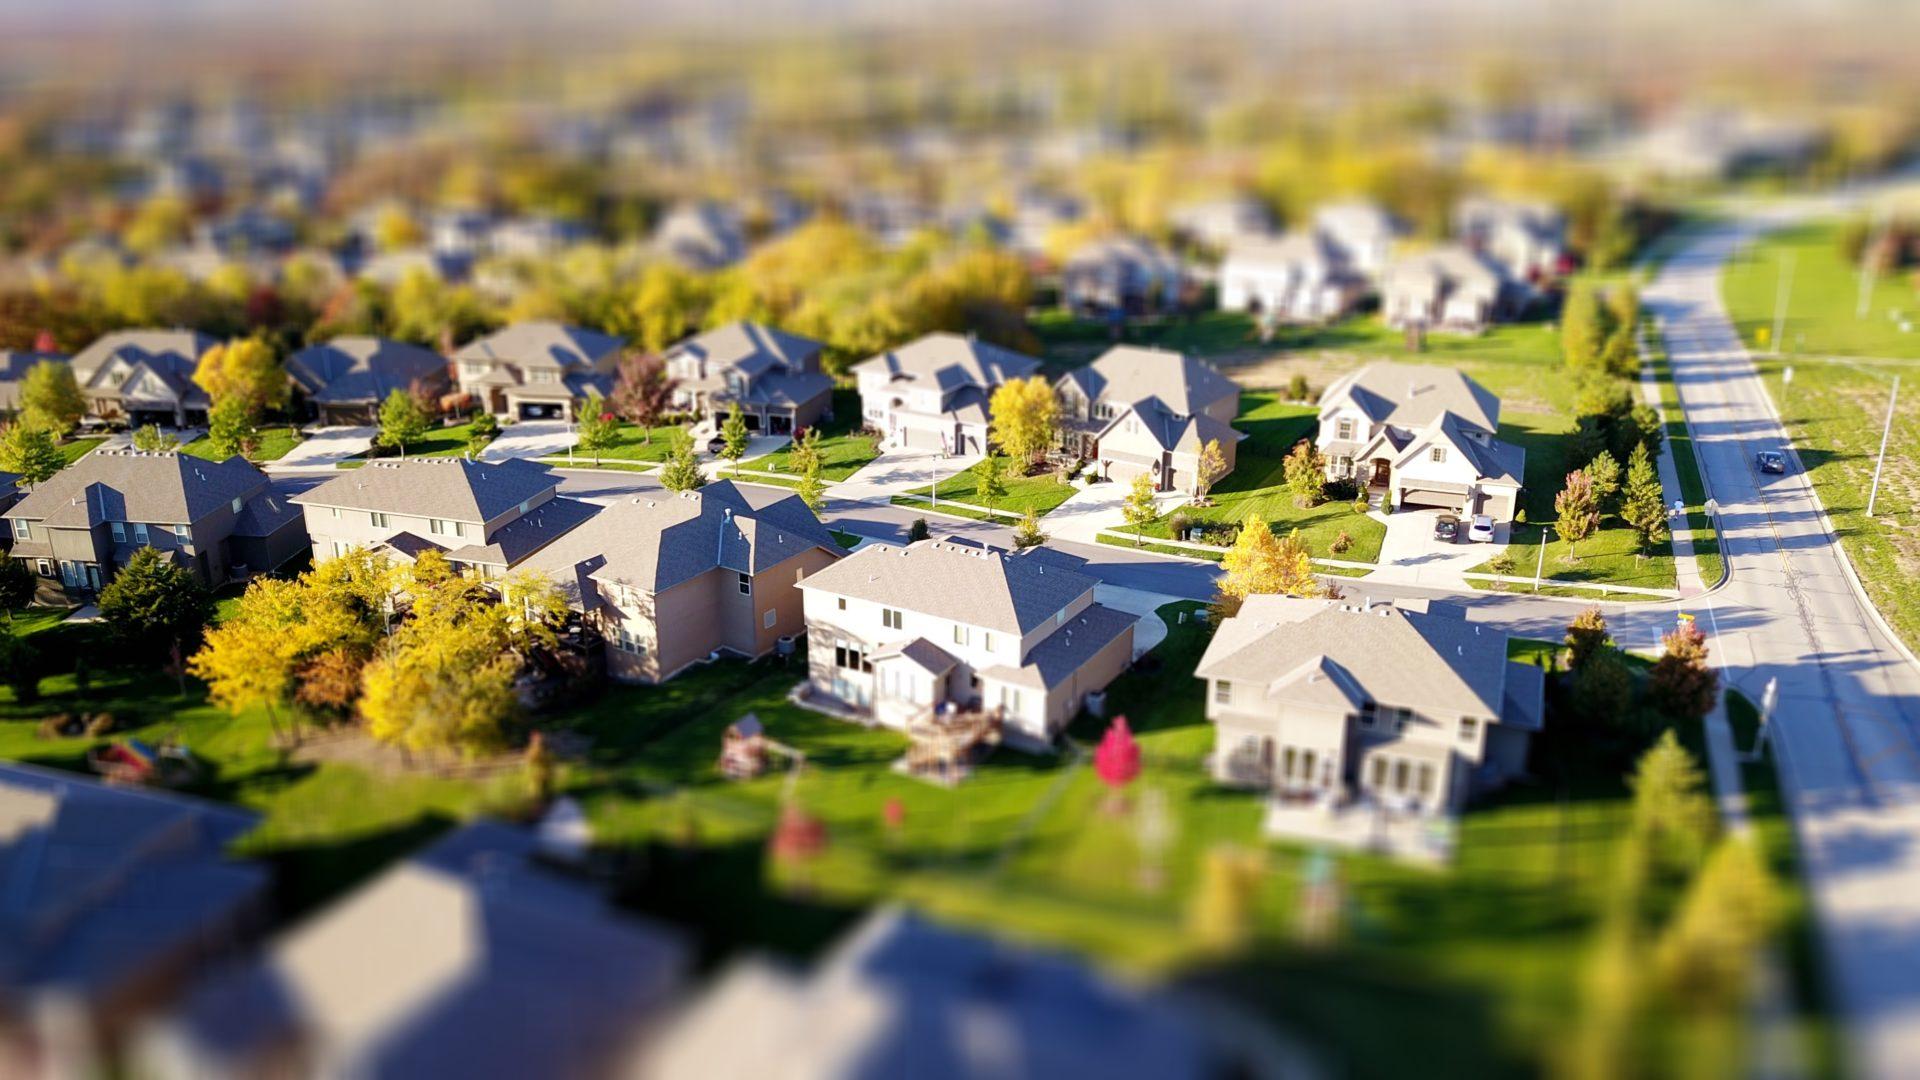 aalsterse hypotheek